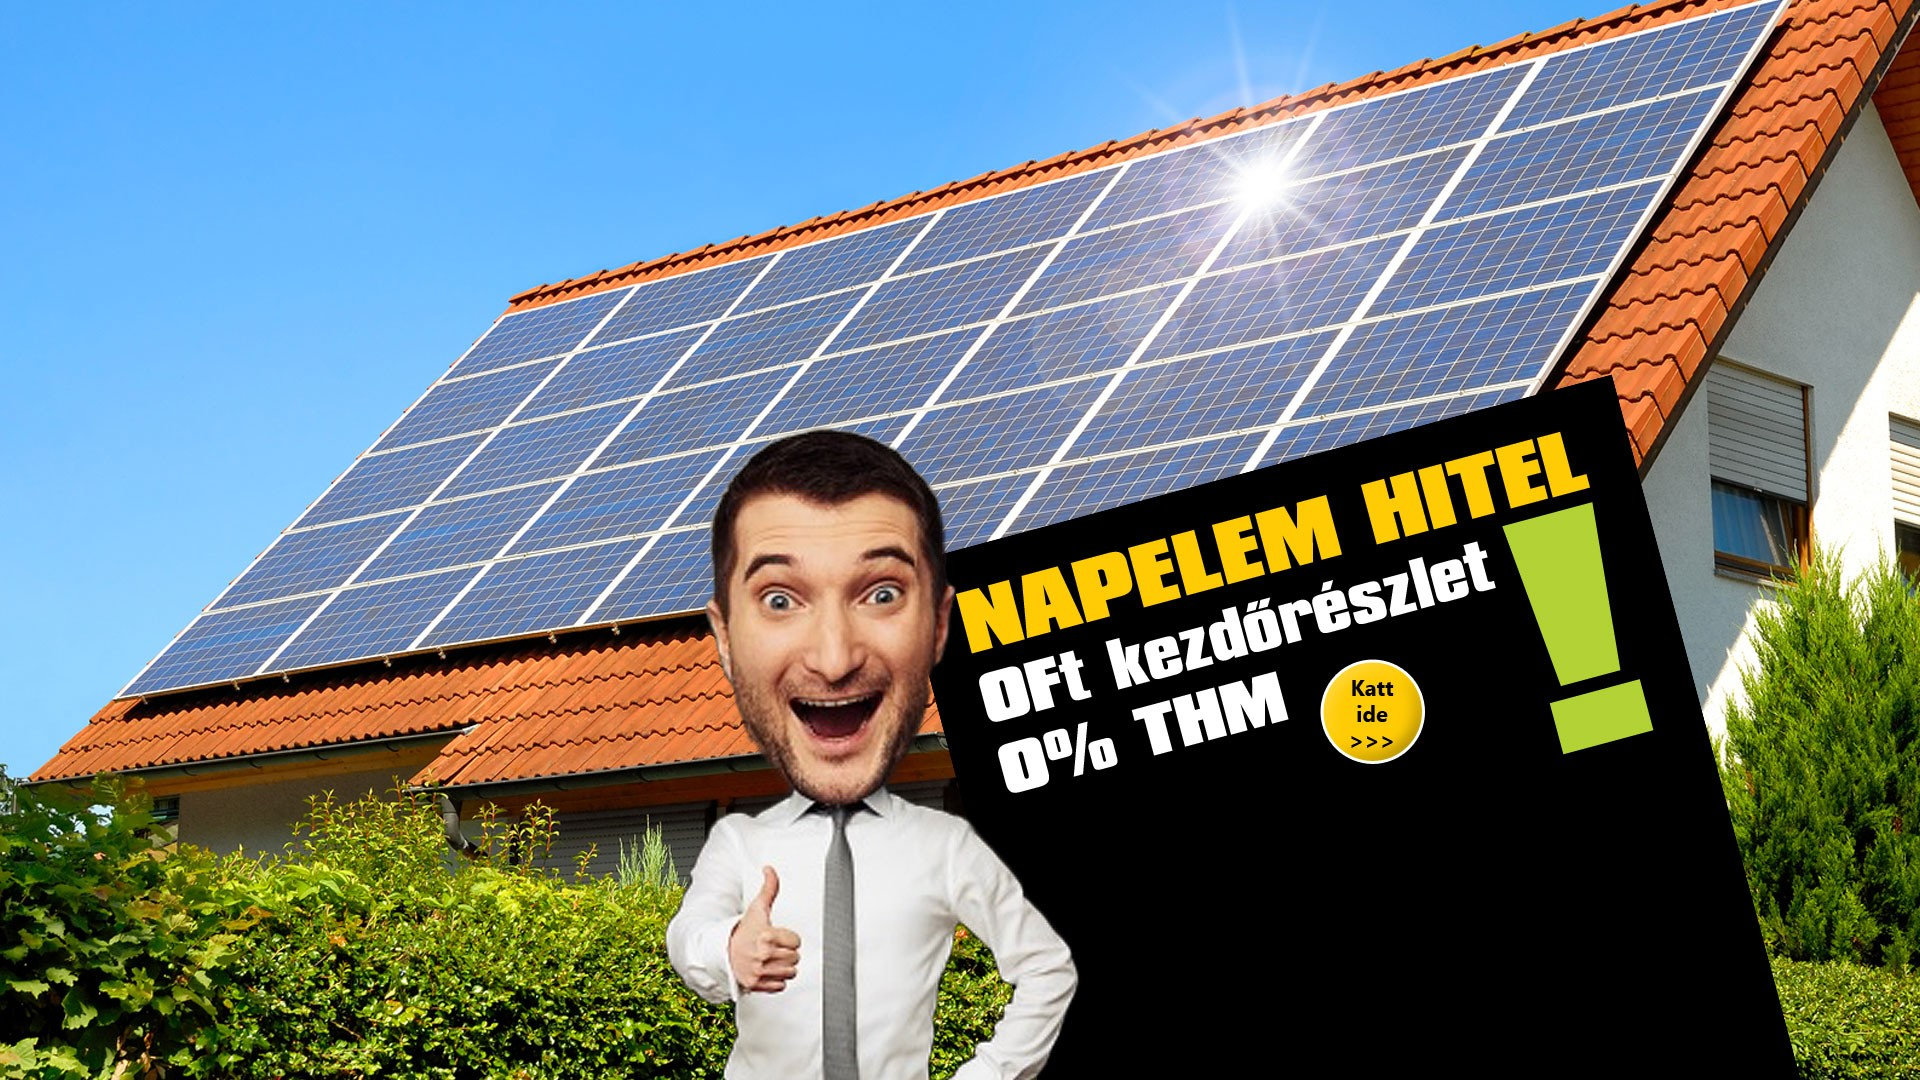 napelem, napelem rendszer 0% THM